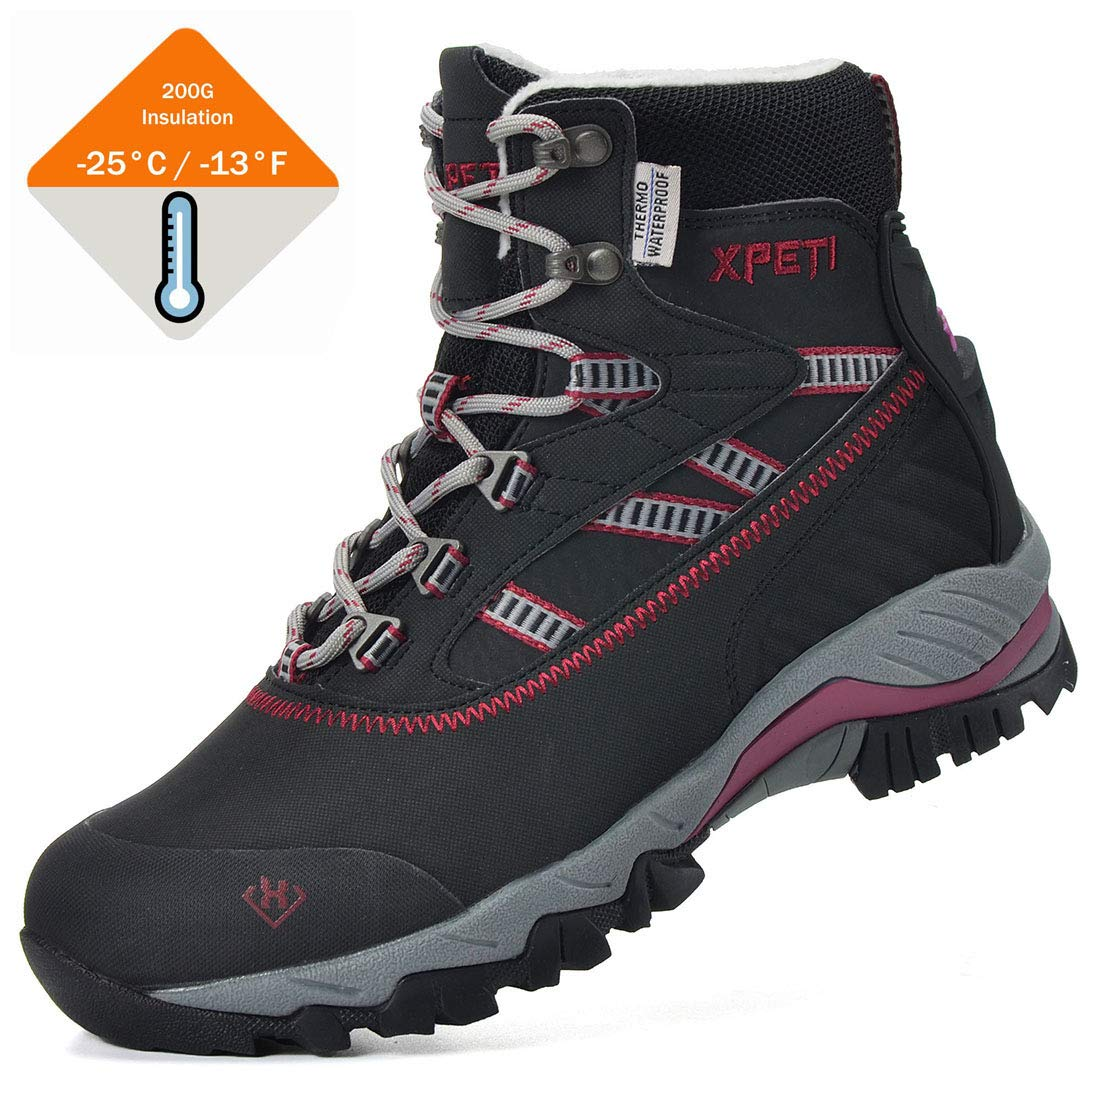 XPETI Women/'s Oslo Winter Snow Waterproof Hiking Boots